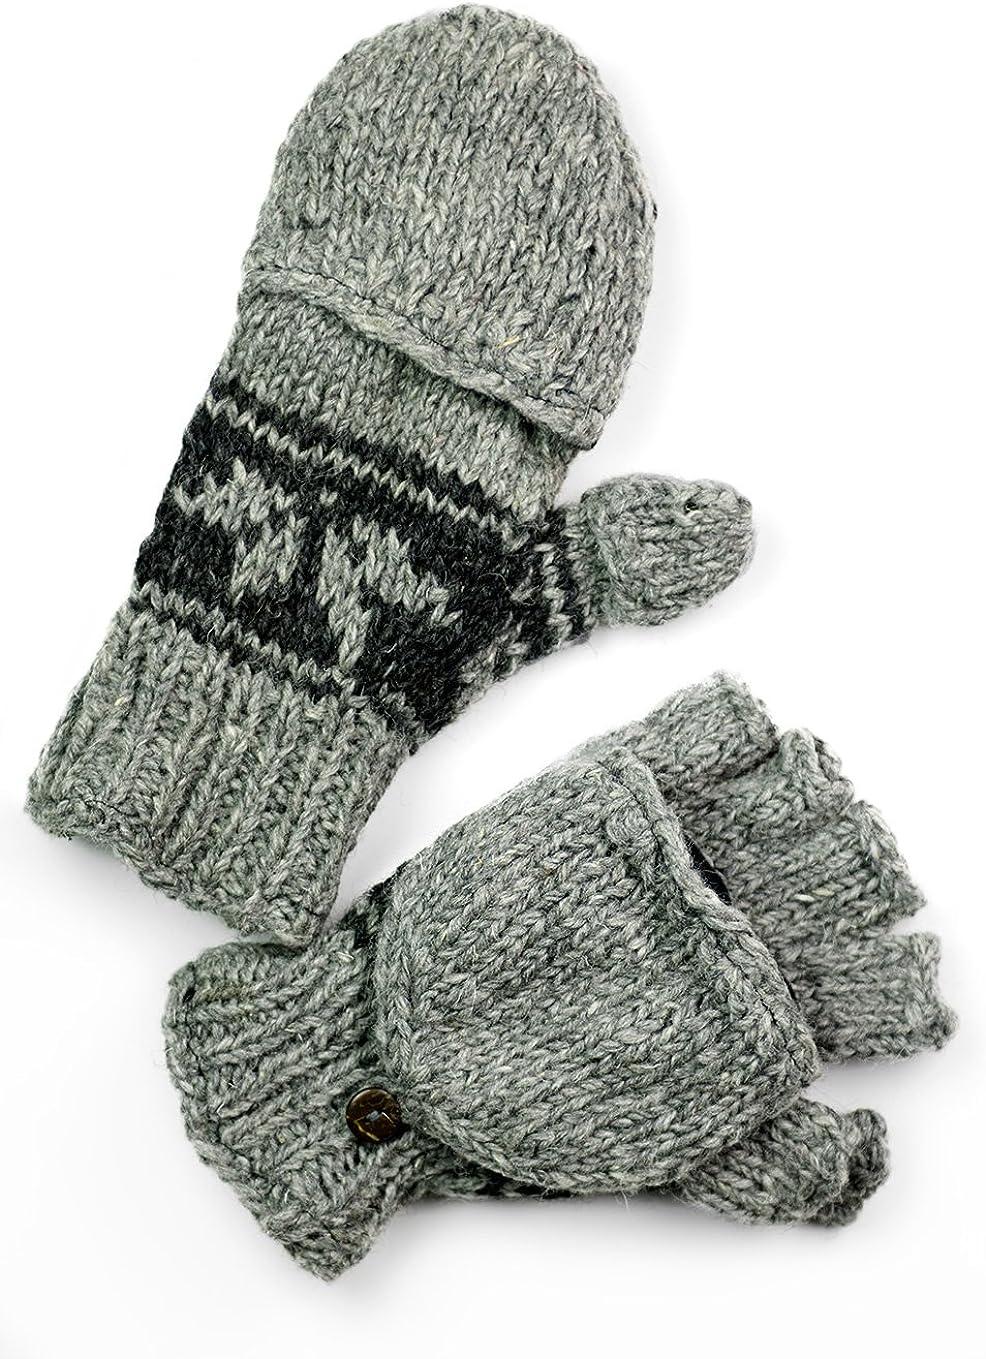 TCG Men's Hand Knit Wool Snowflake Glittens - Pewter & Charcoal